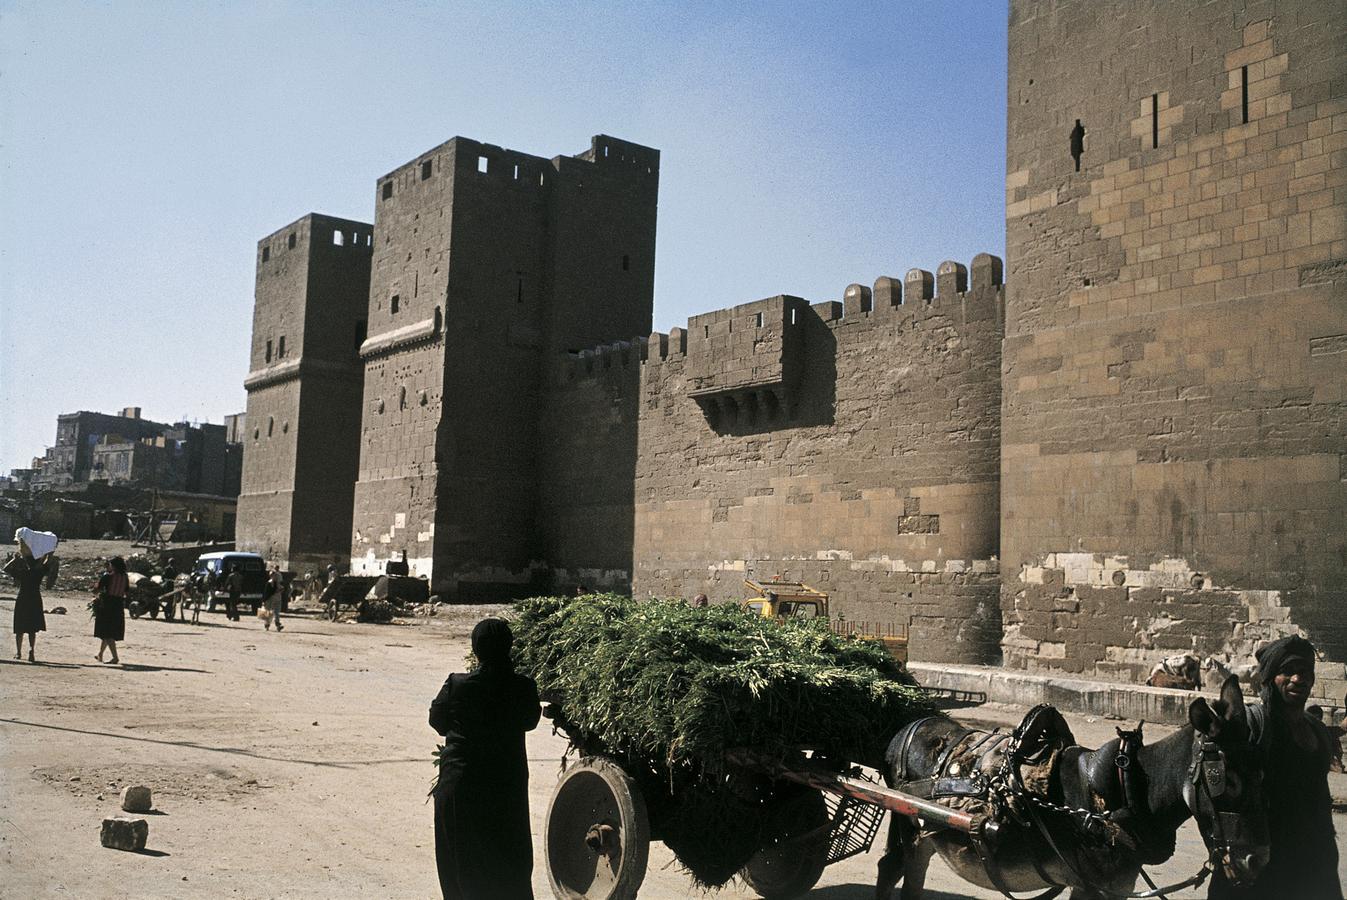 Bab-al-Nasr-byport_-Cairo_-Egypten.-HMH 1087.jpg